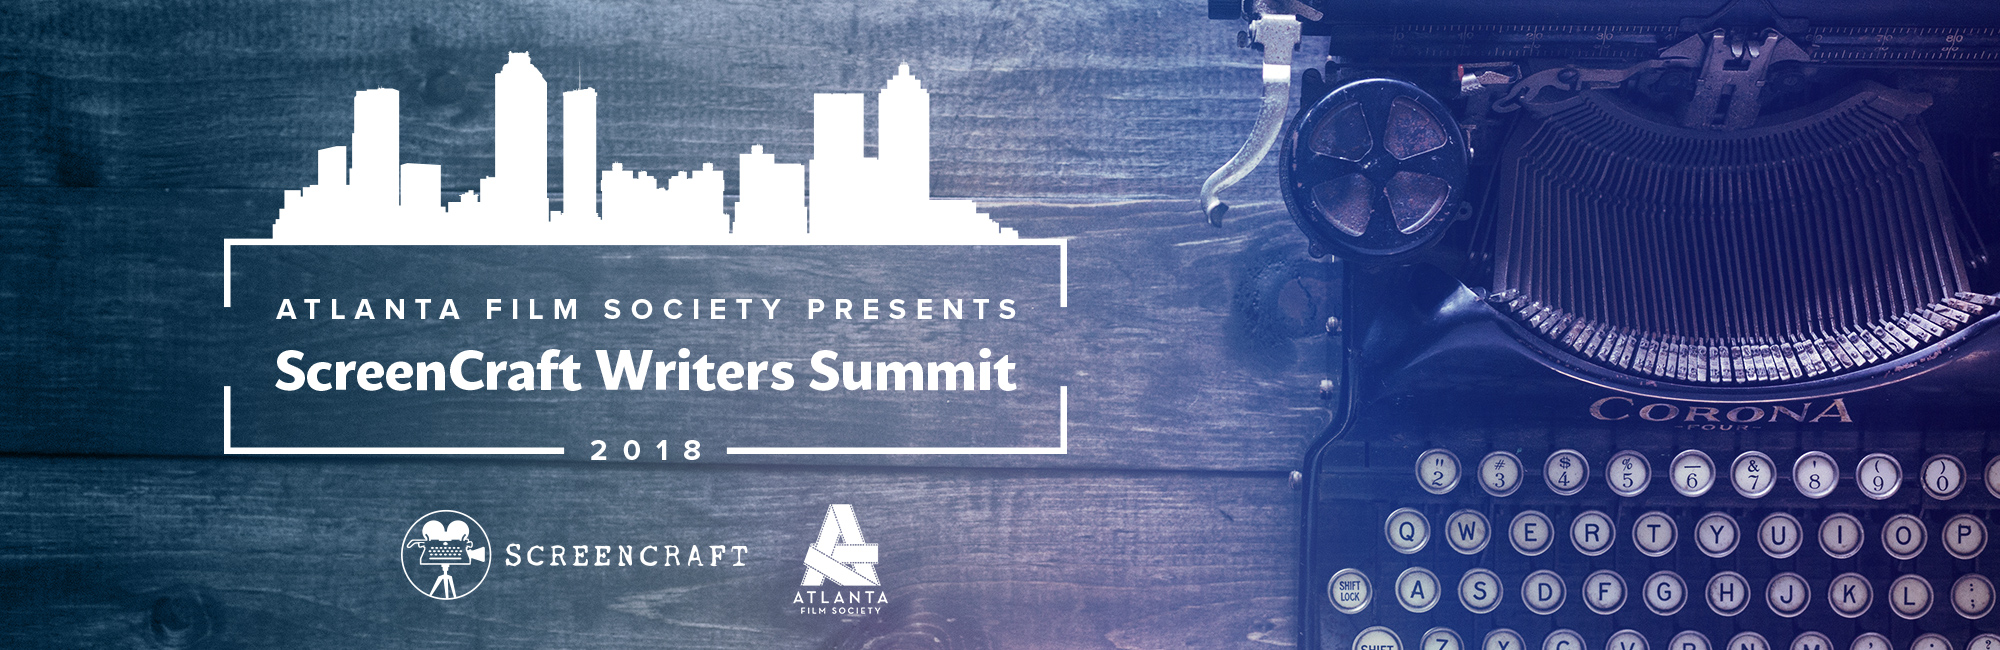 2018-screencraft-summit-atlanta-2000x650.jpg